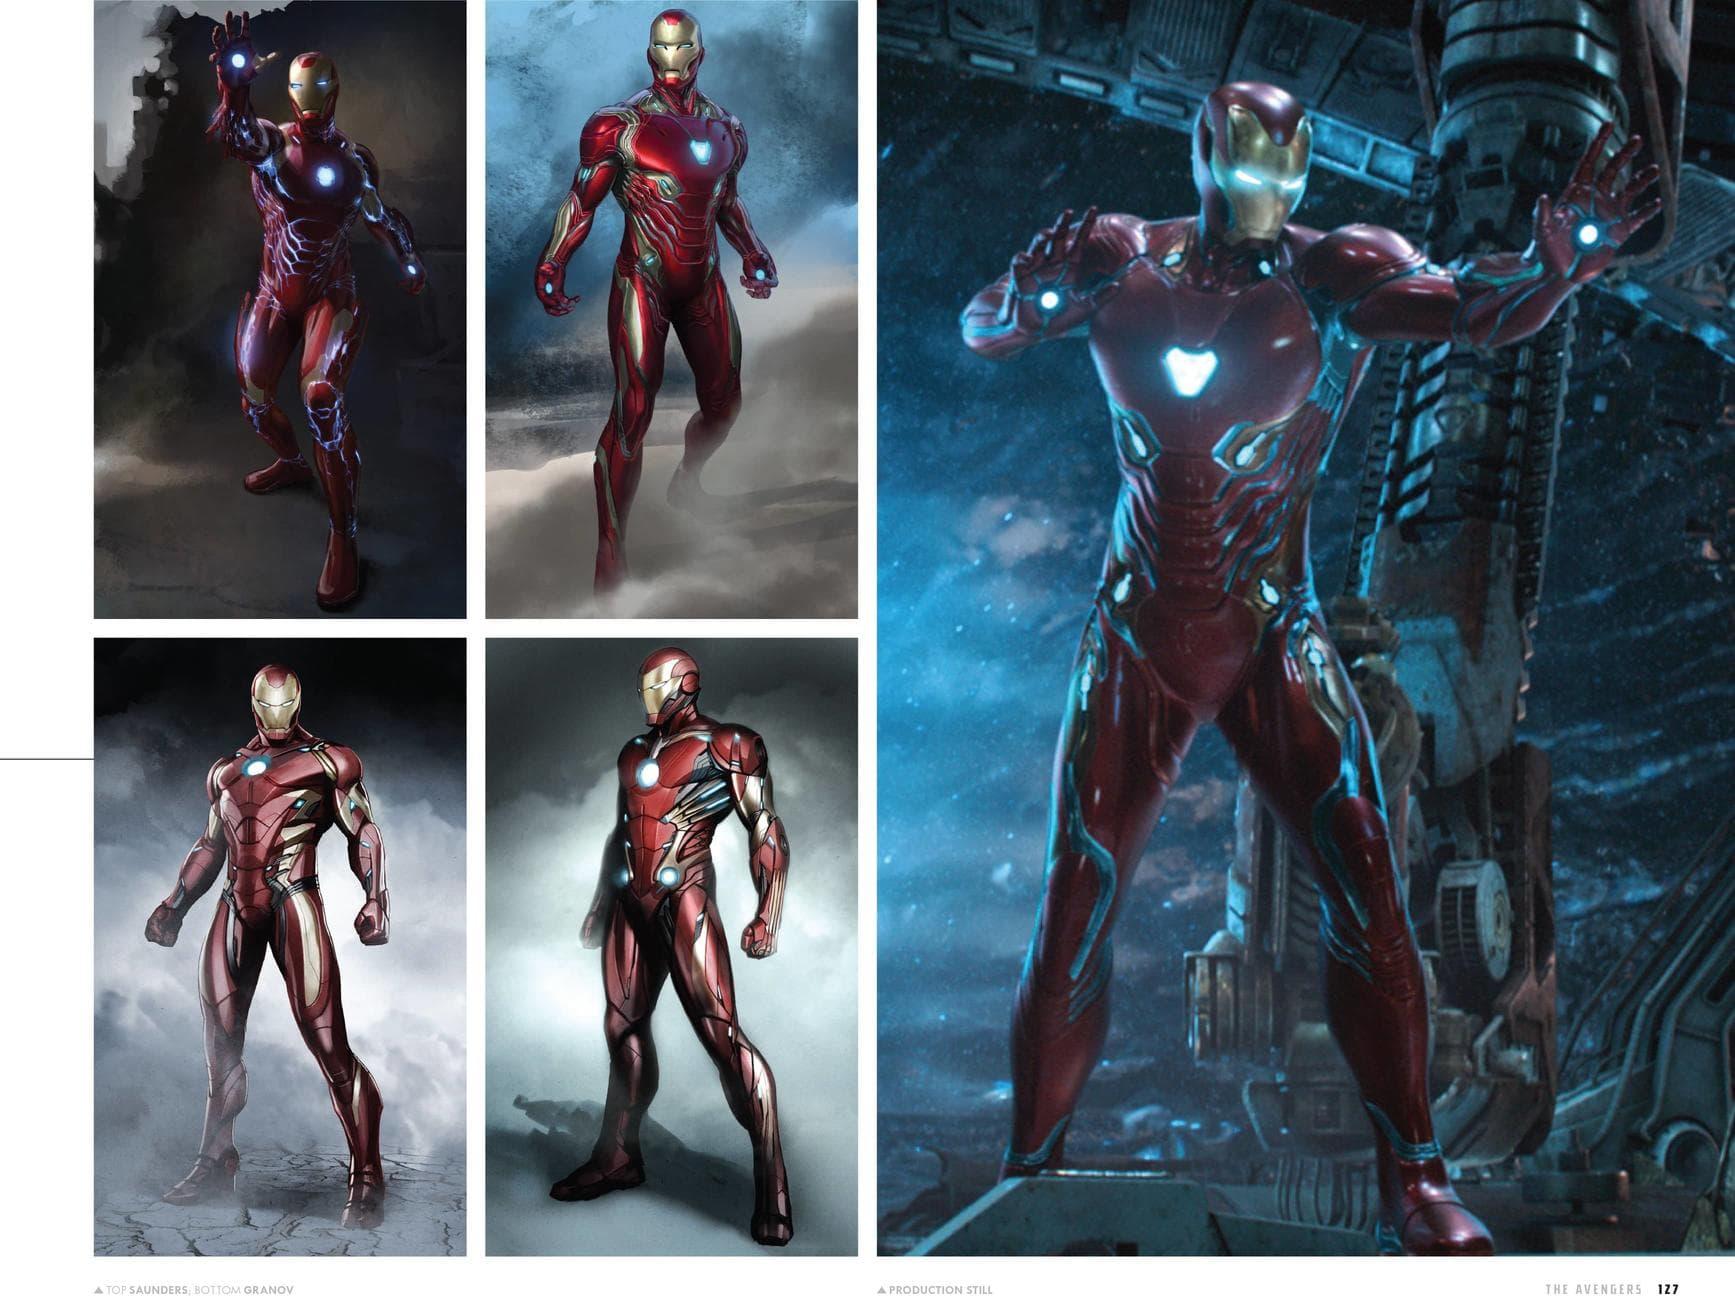 Road to Avengers: Endgame